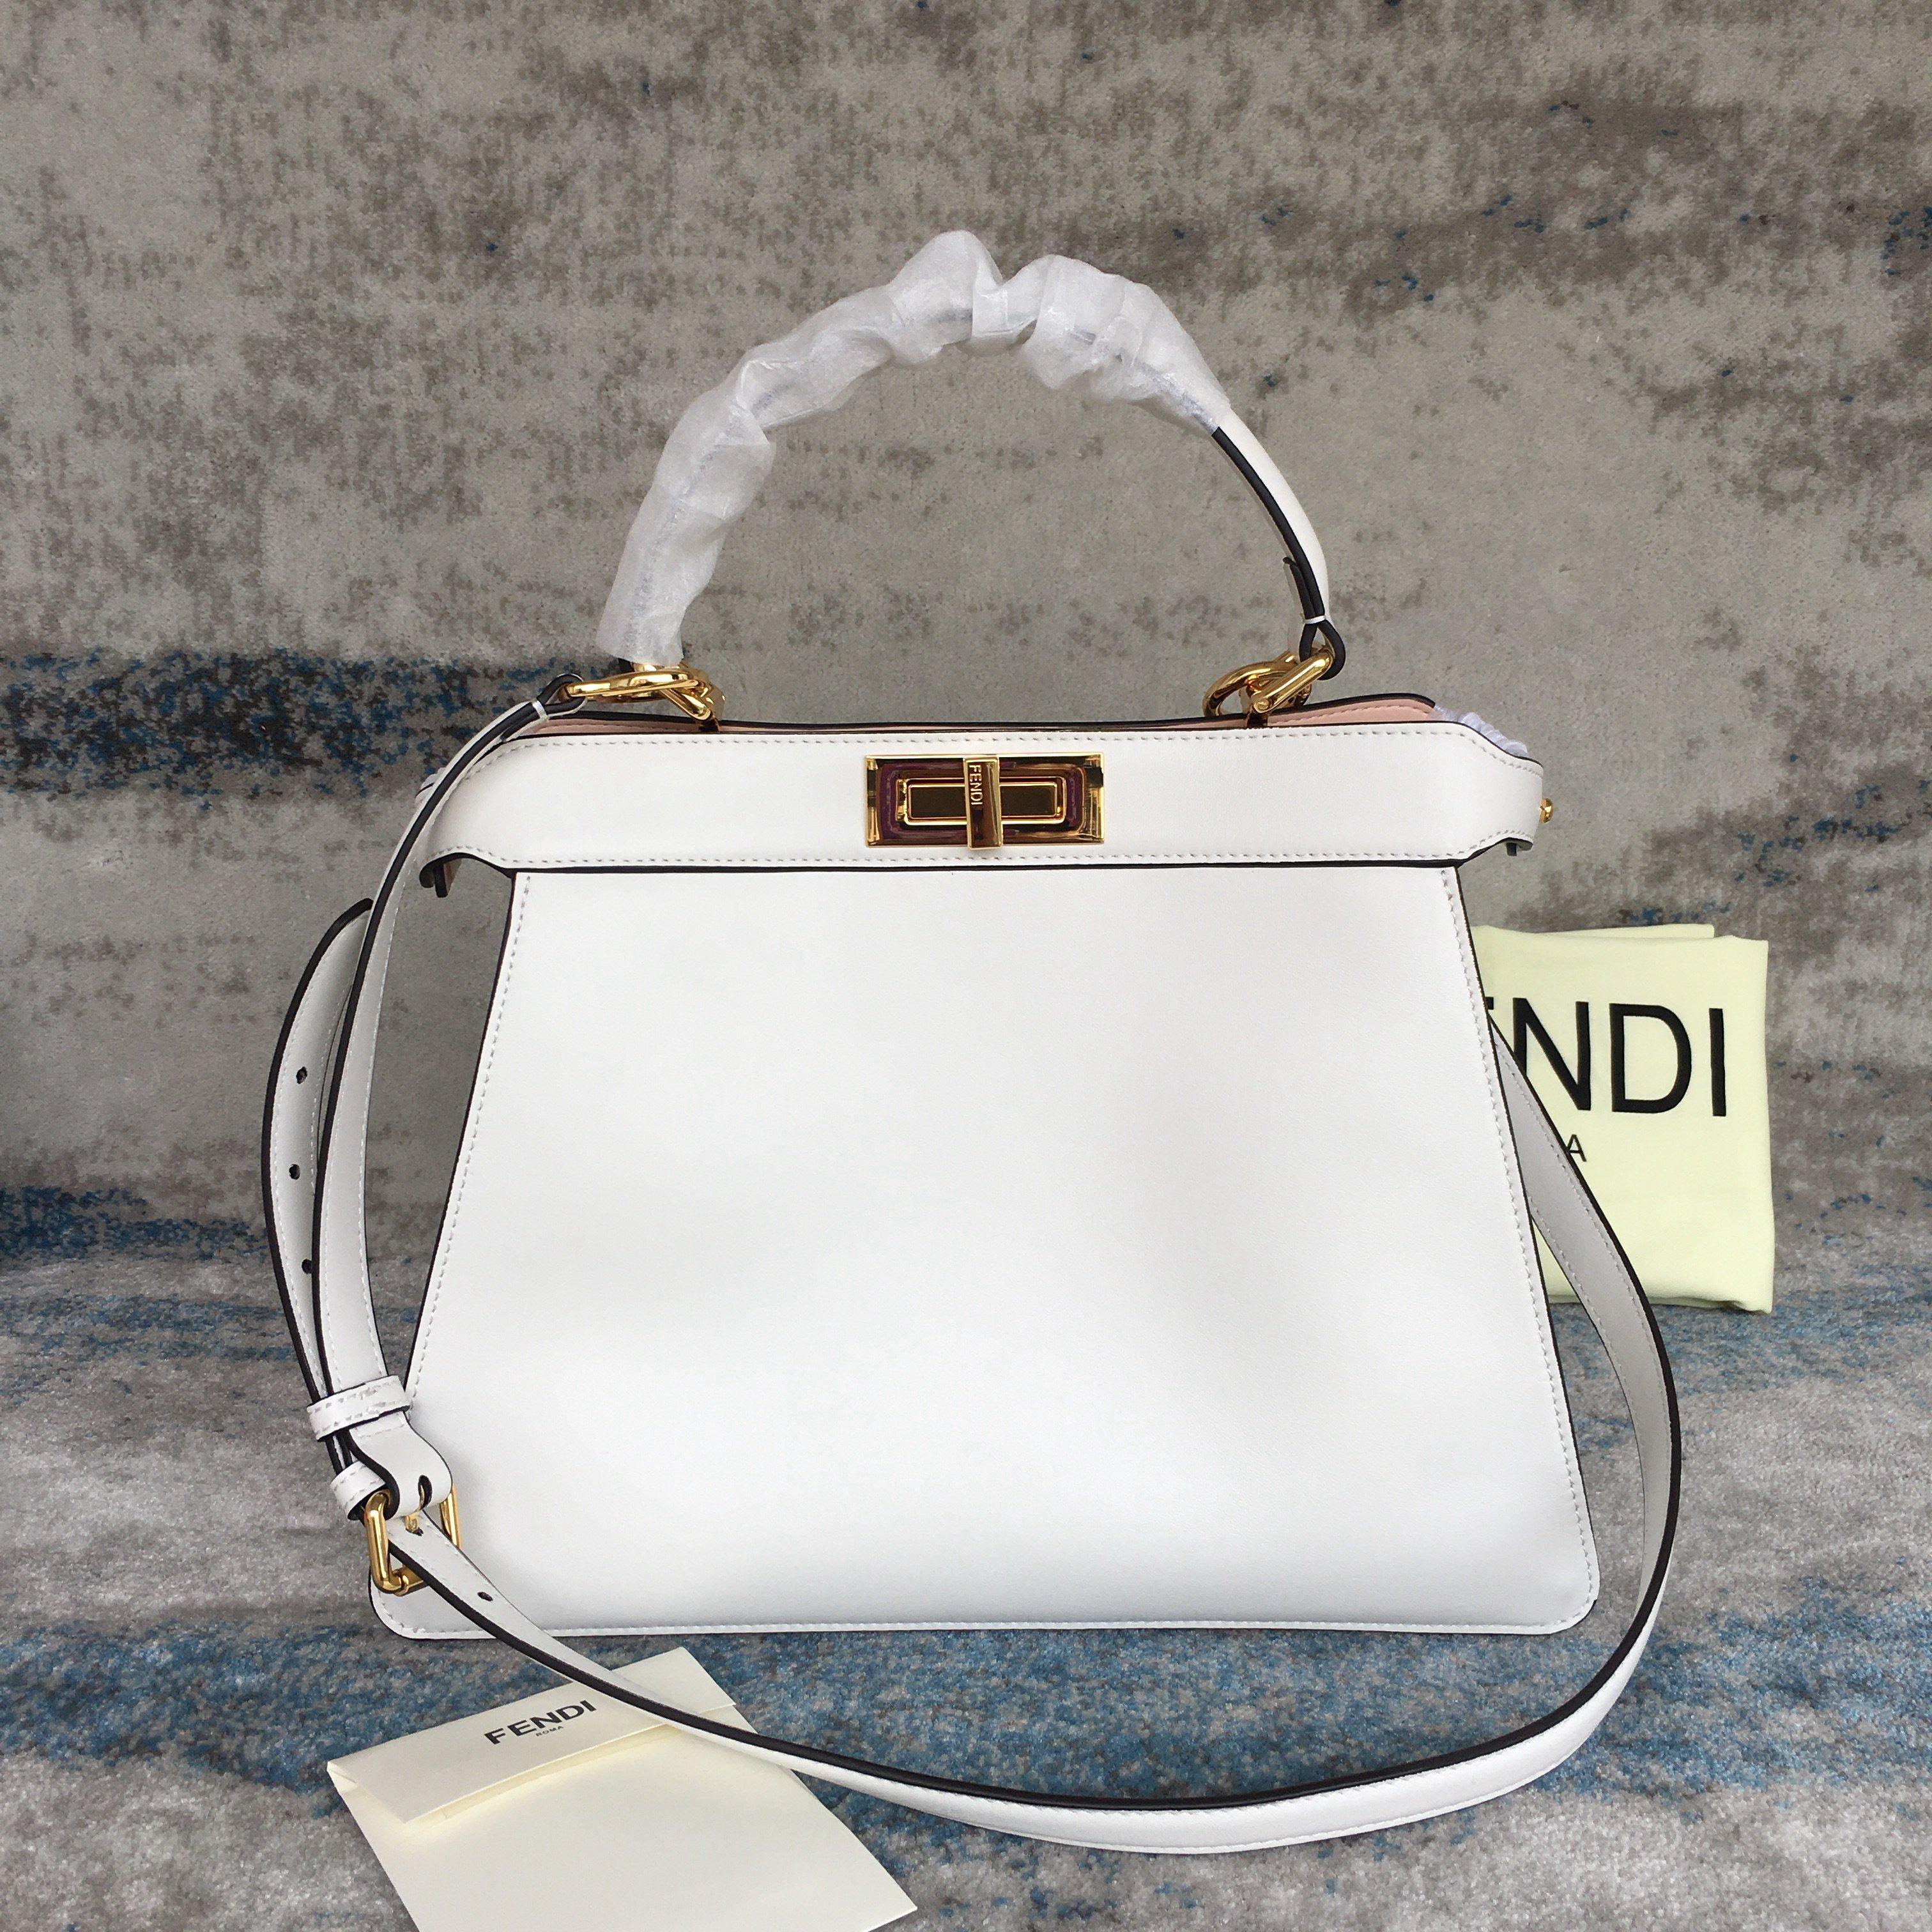 Fendi PEEKABOO ESSENTIALLY Handbag